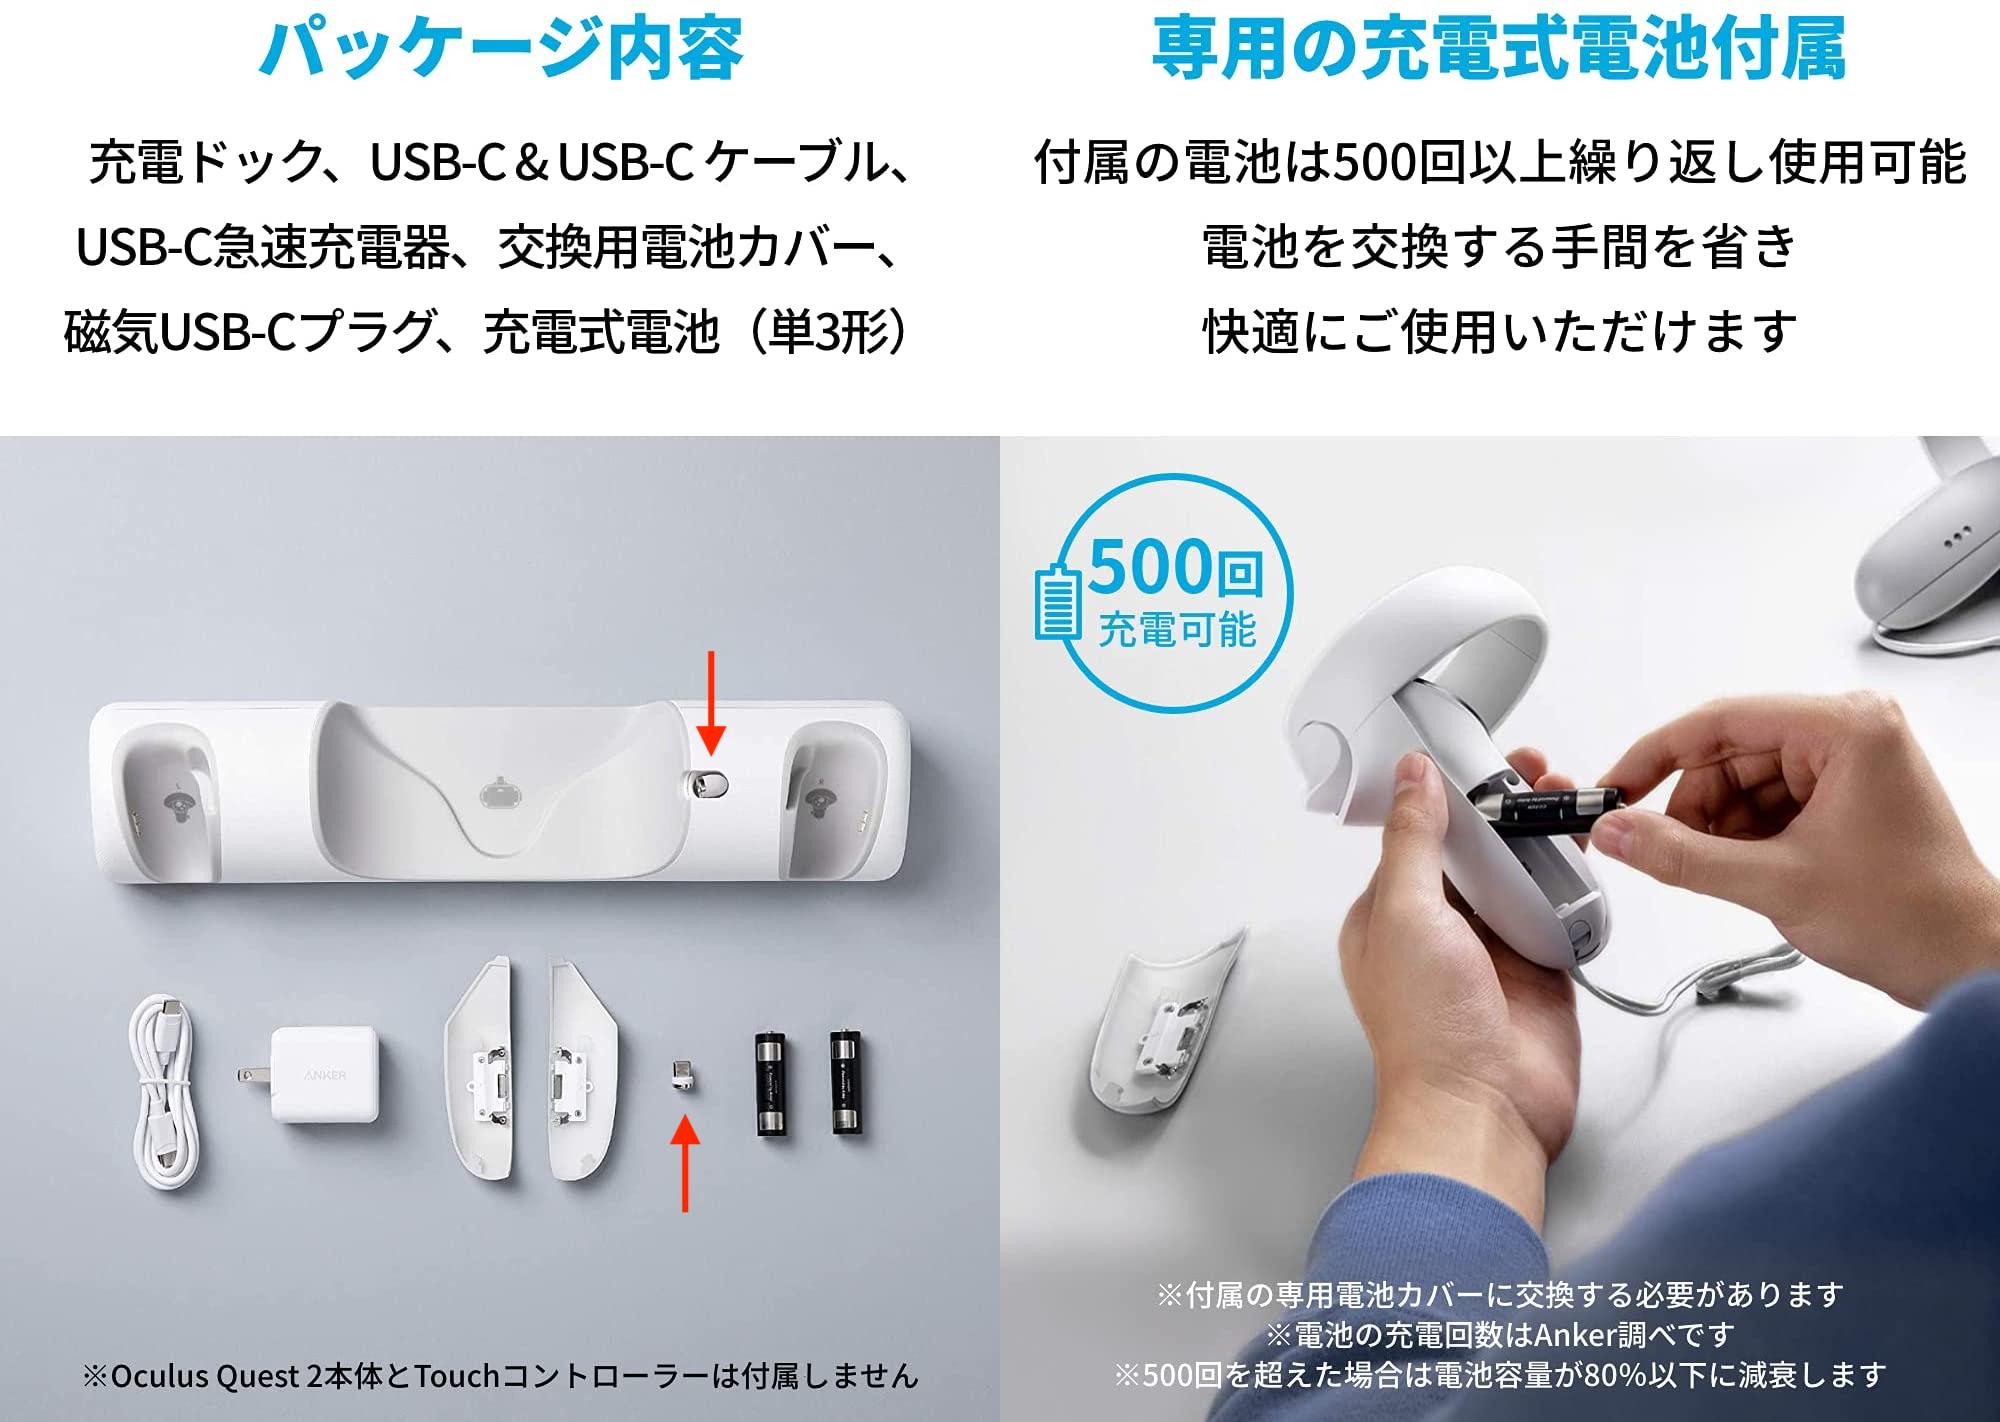 USB-Cプラグと磁気出力コネクタ